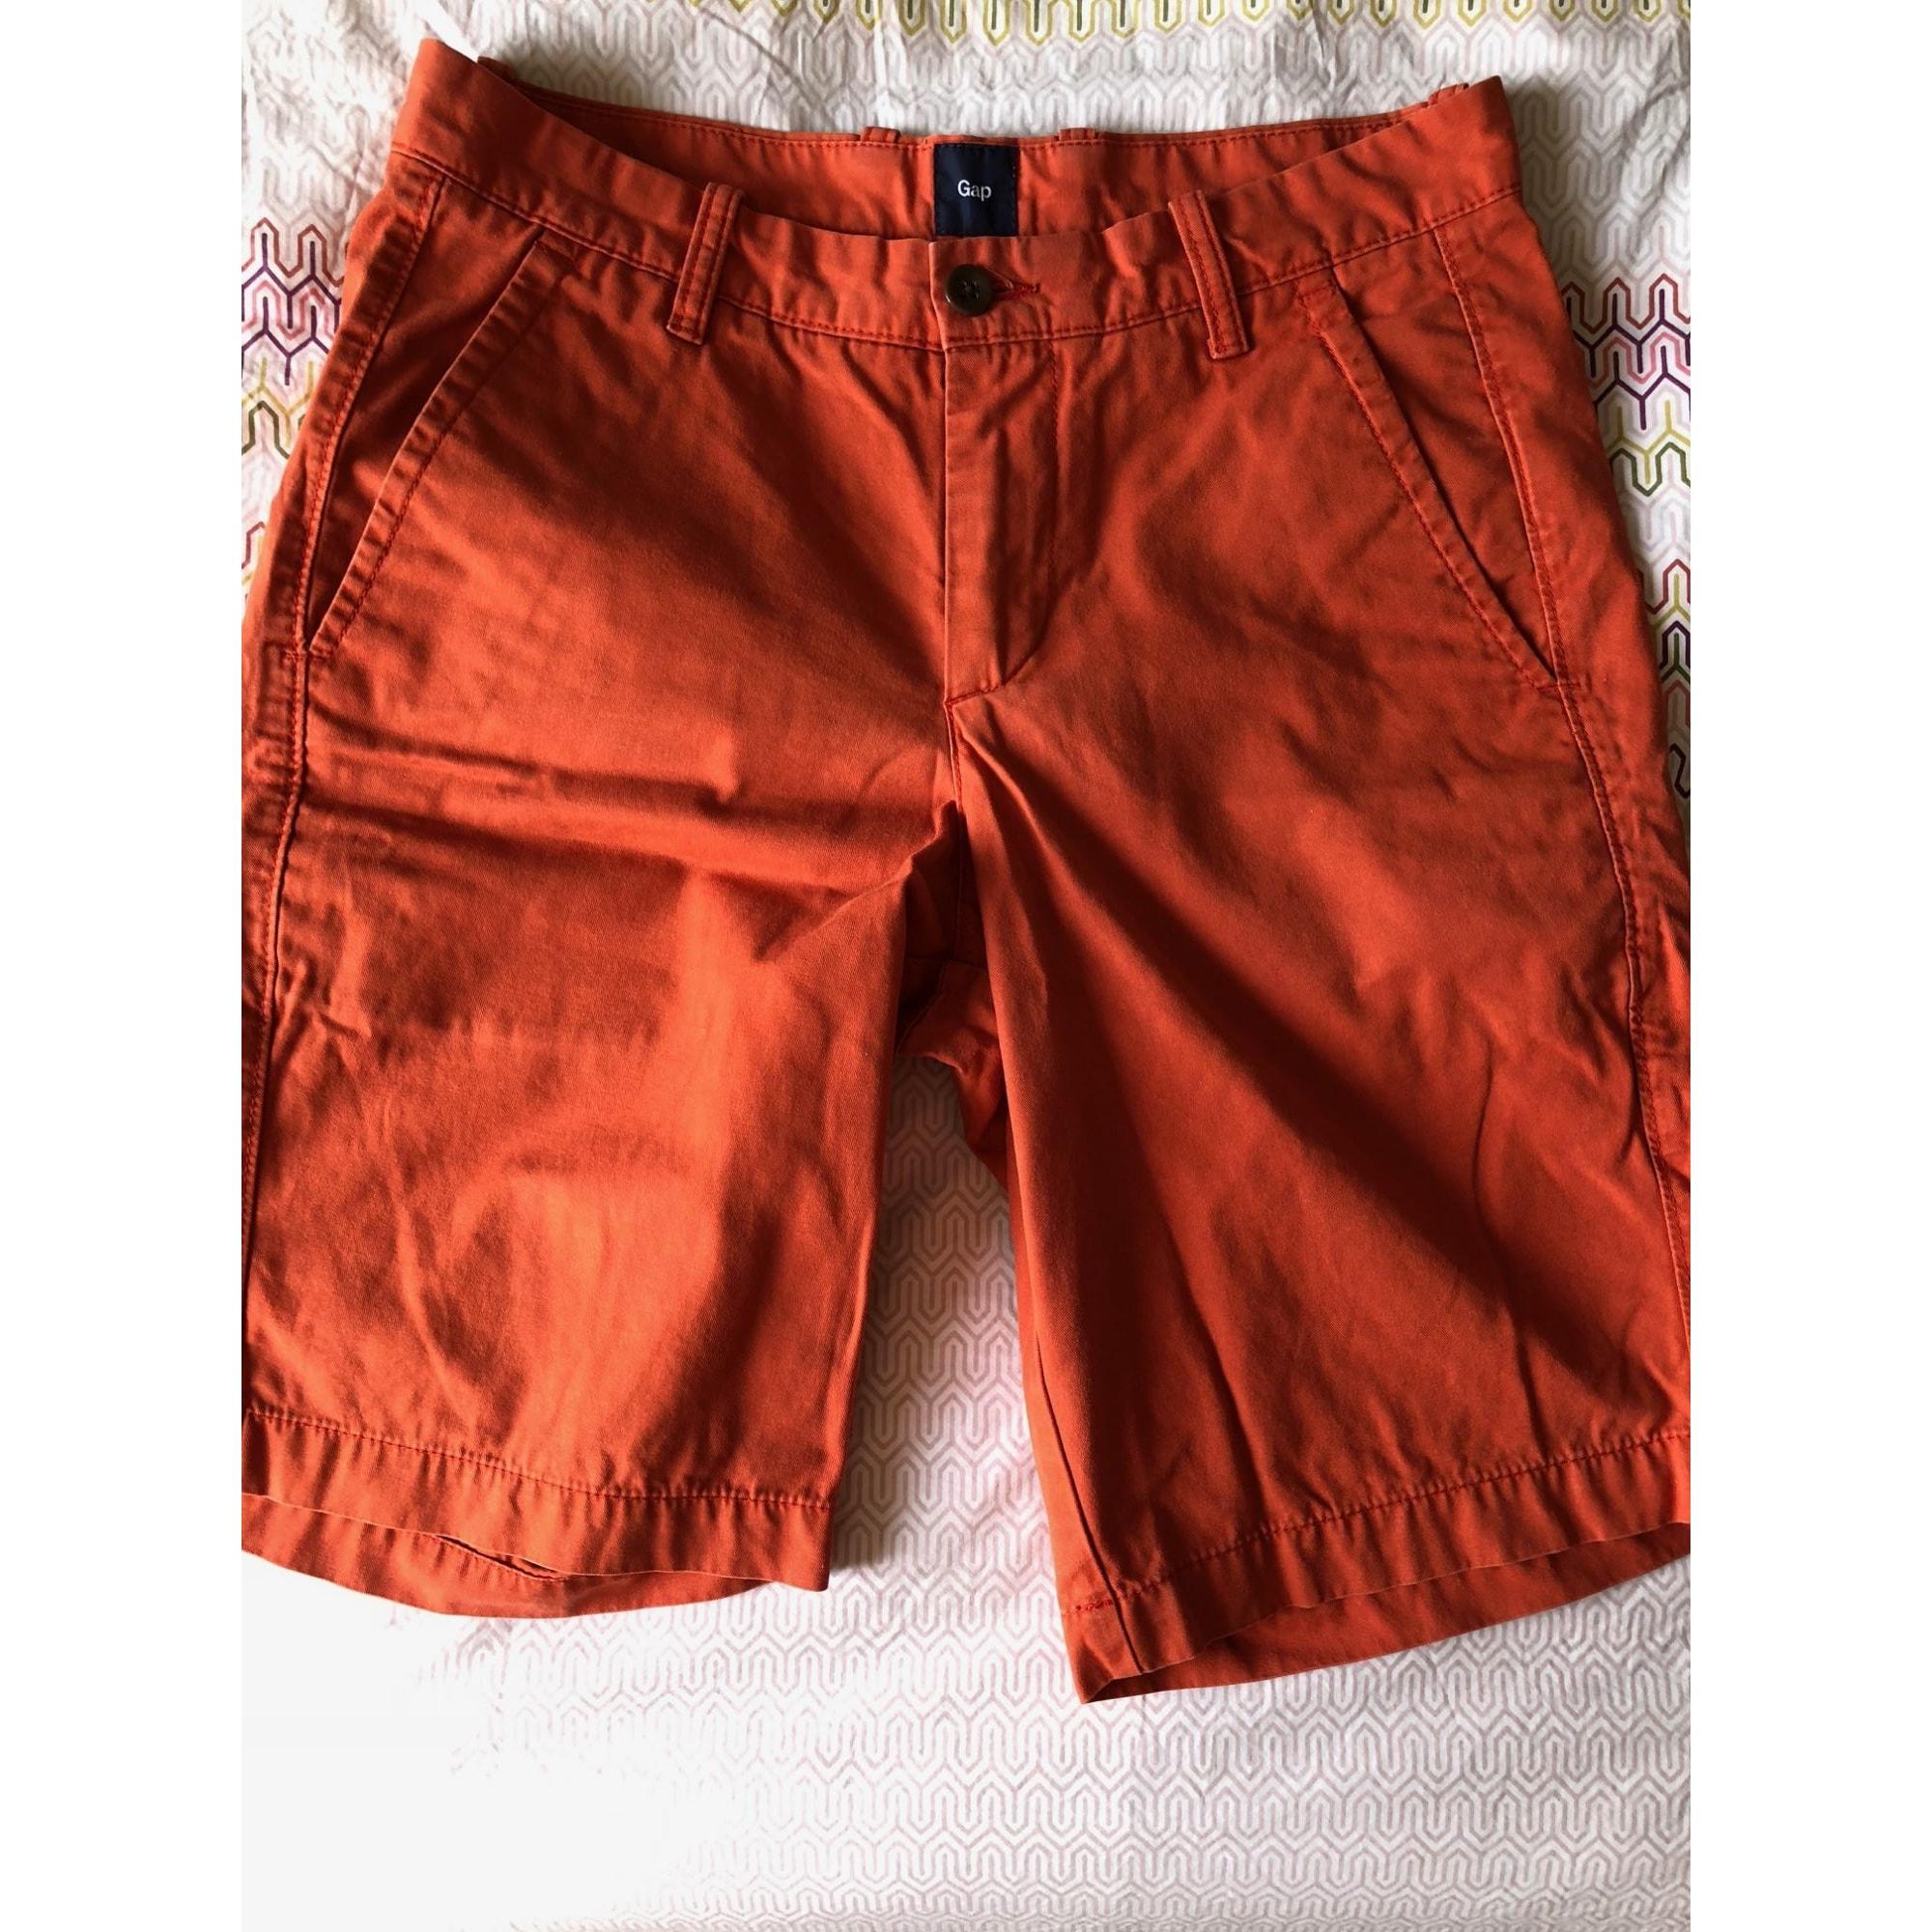 Bermuda GAP Orange